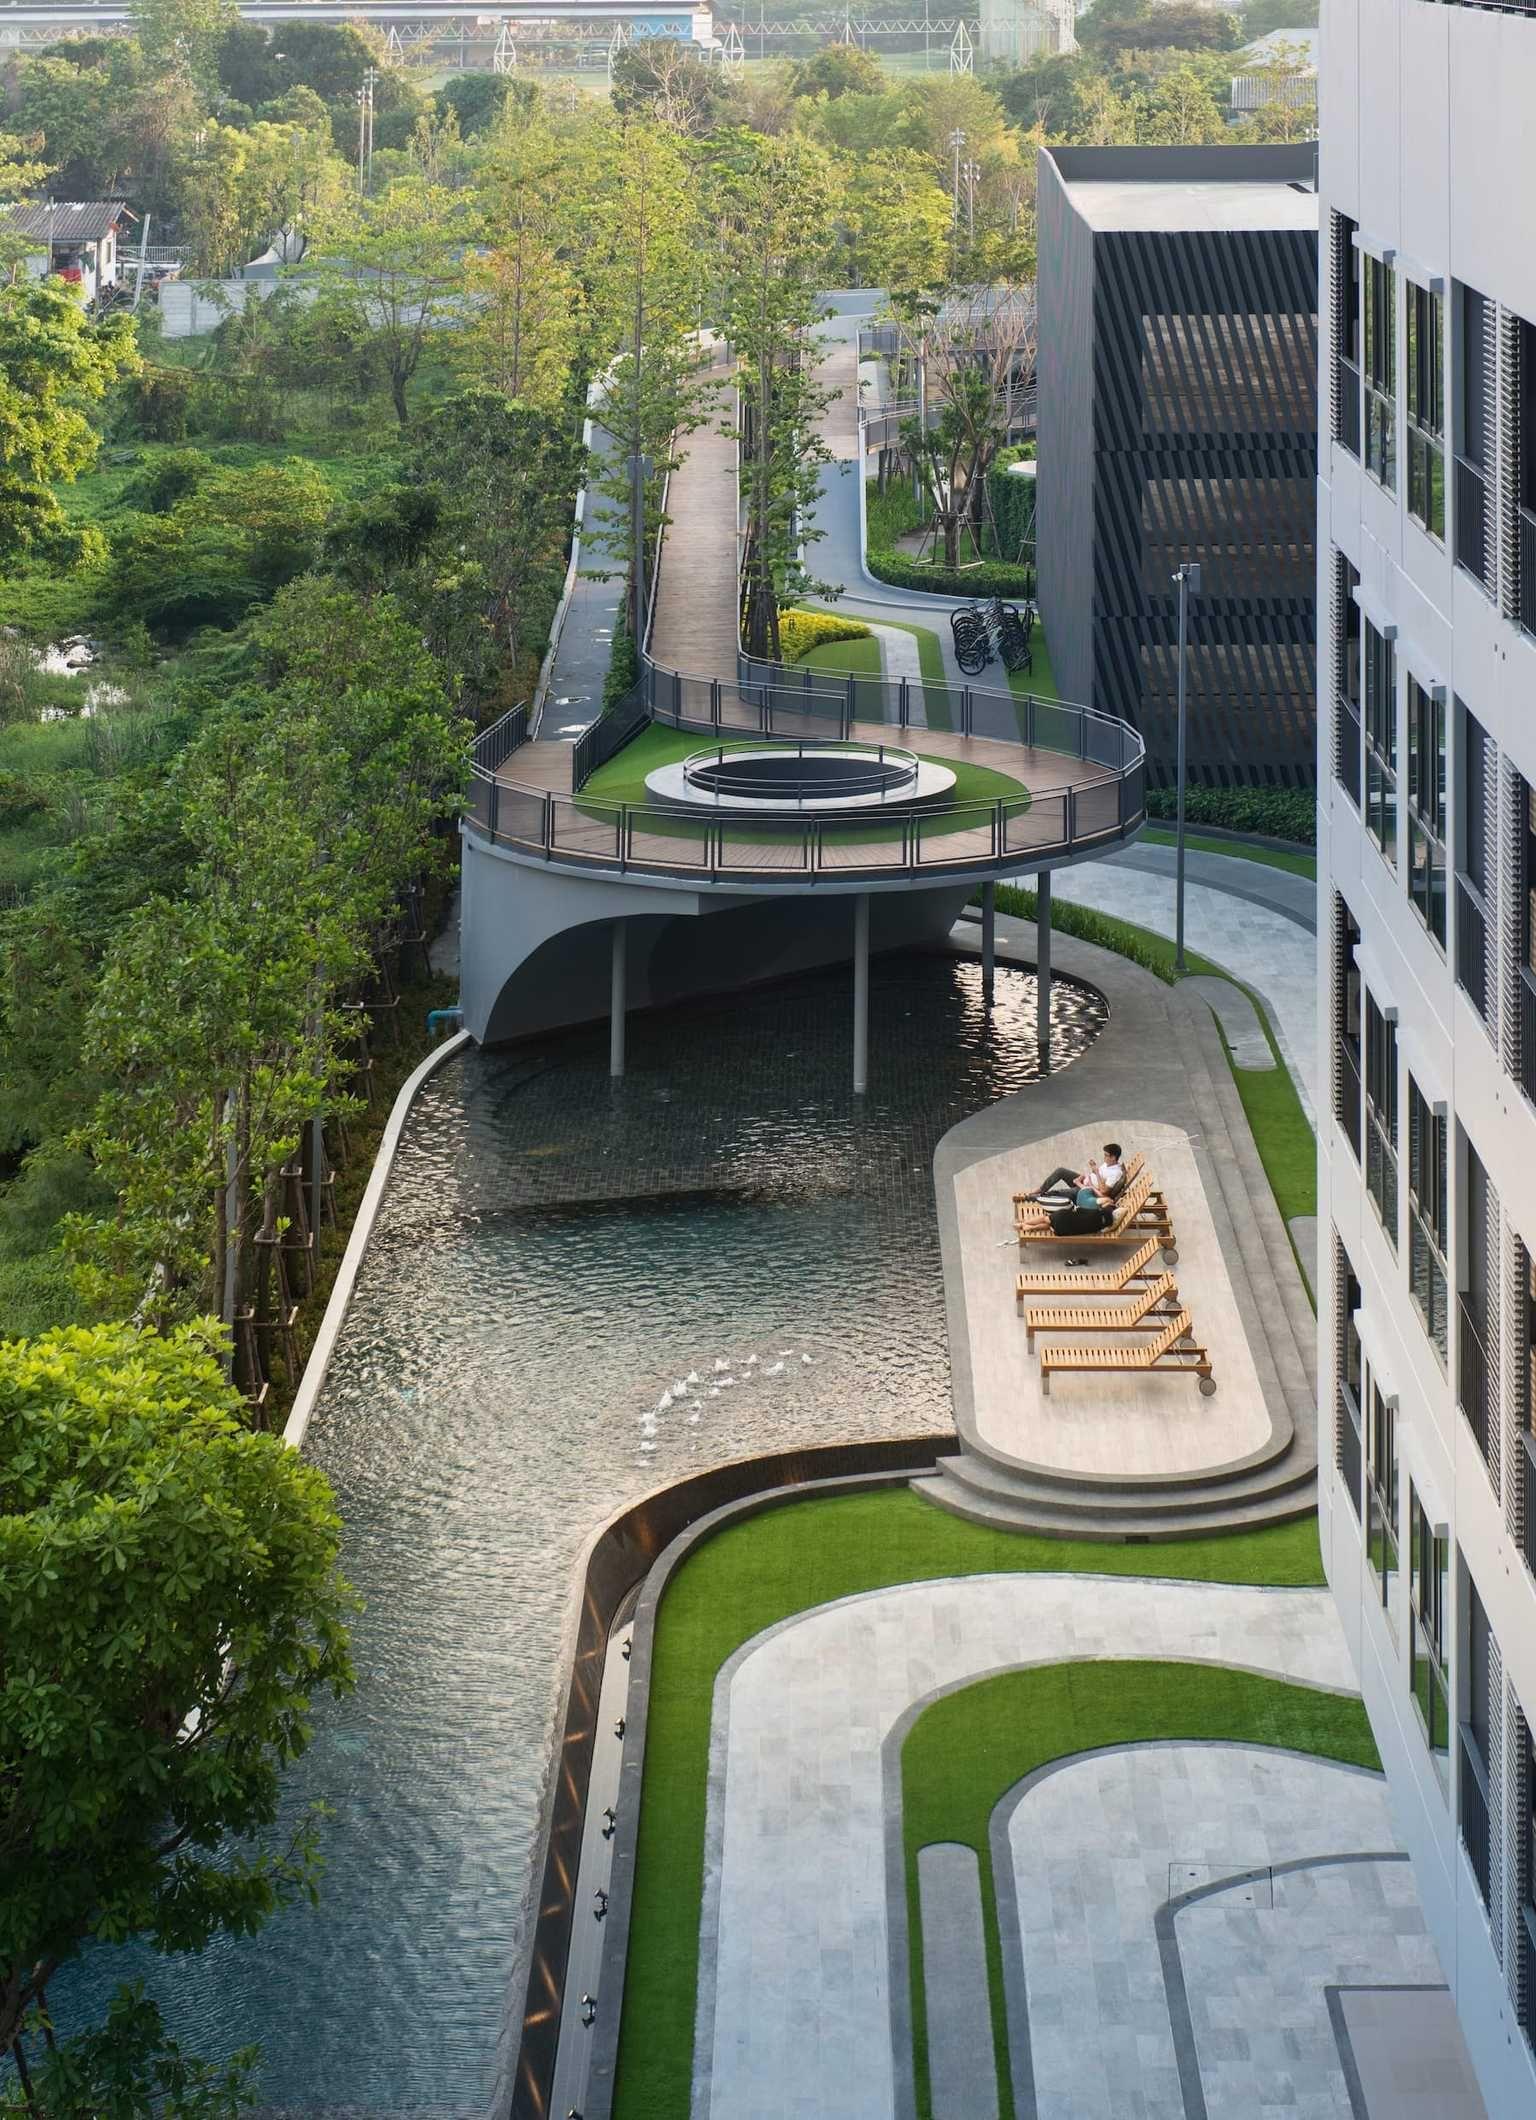 Pin On Mooool 公寓住宅景观apartment Residence Landscape